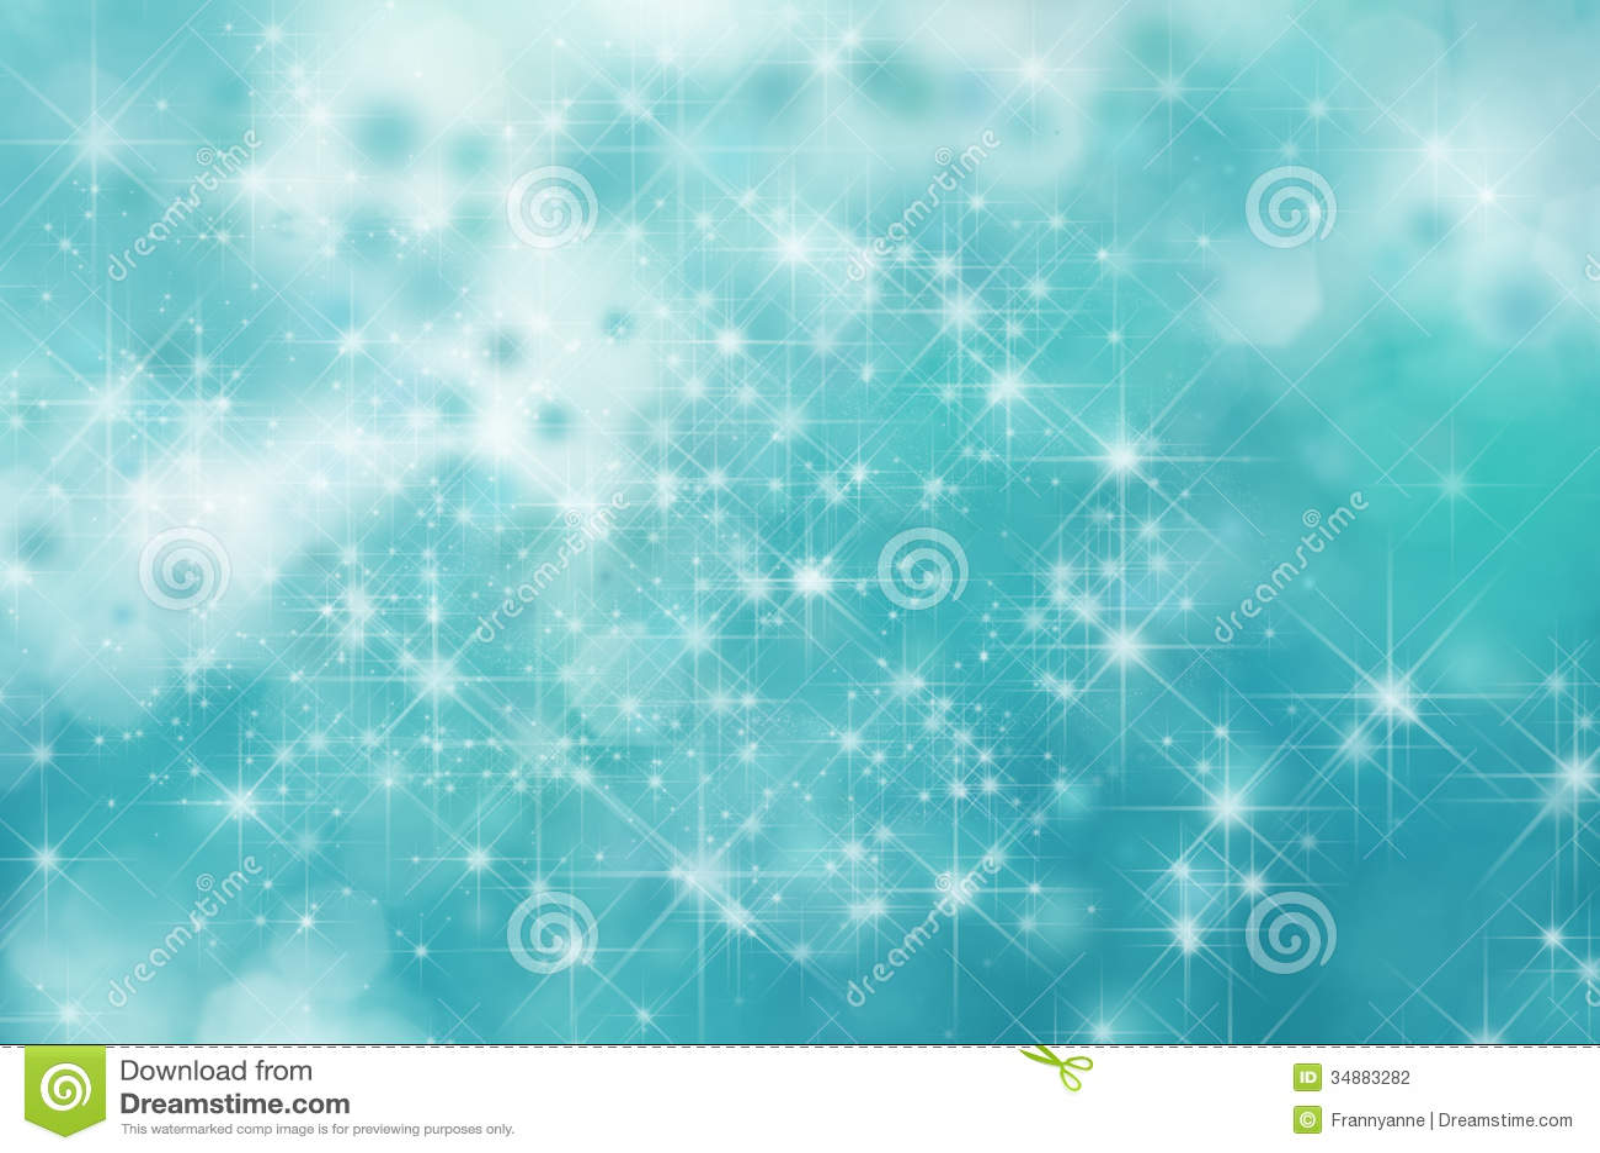 turquoise stars backgrounds - photo #3